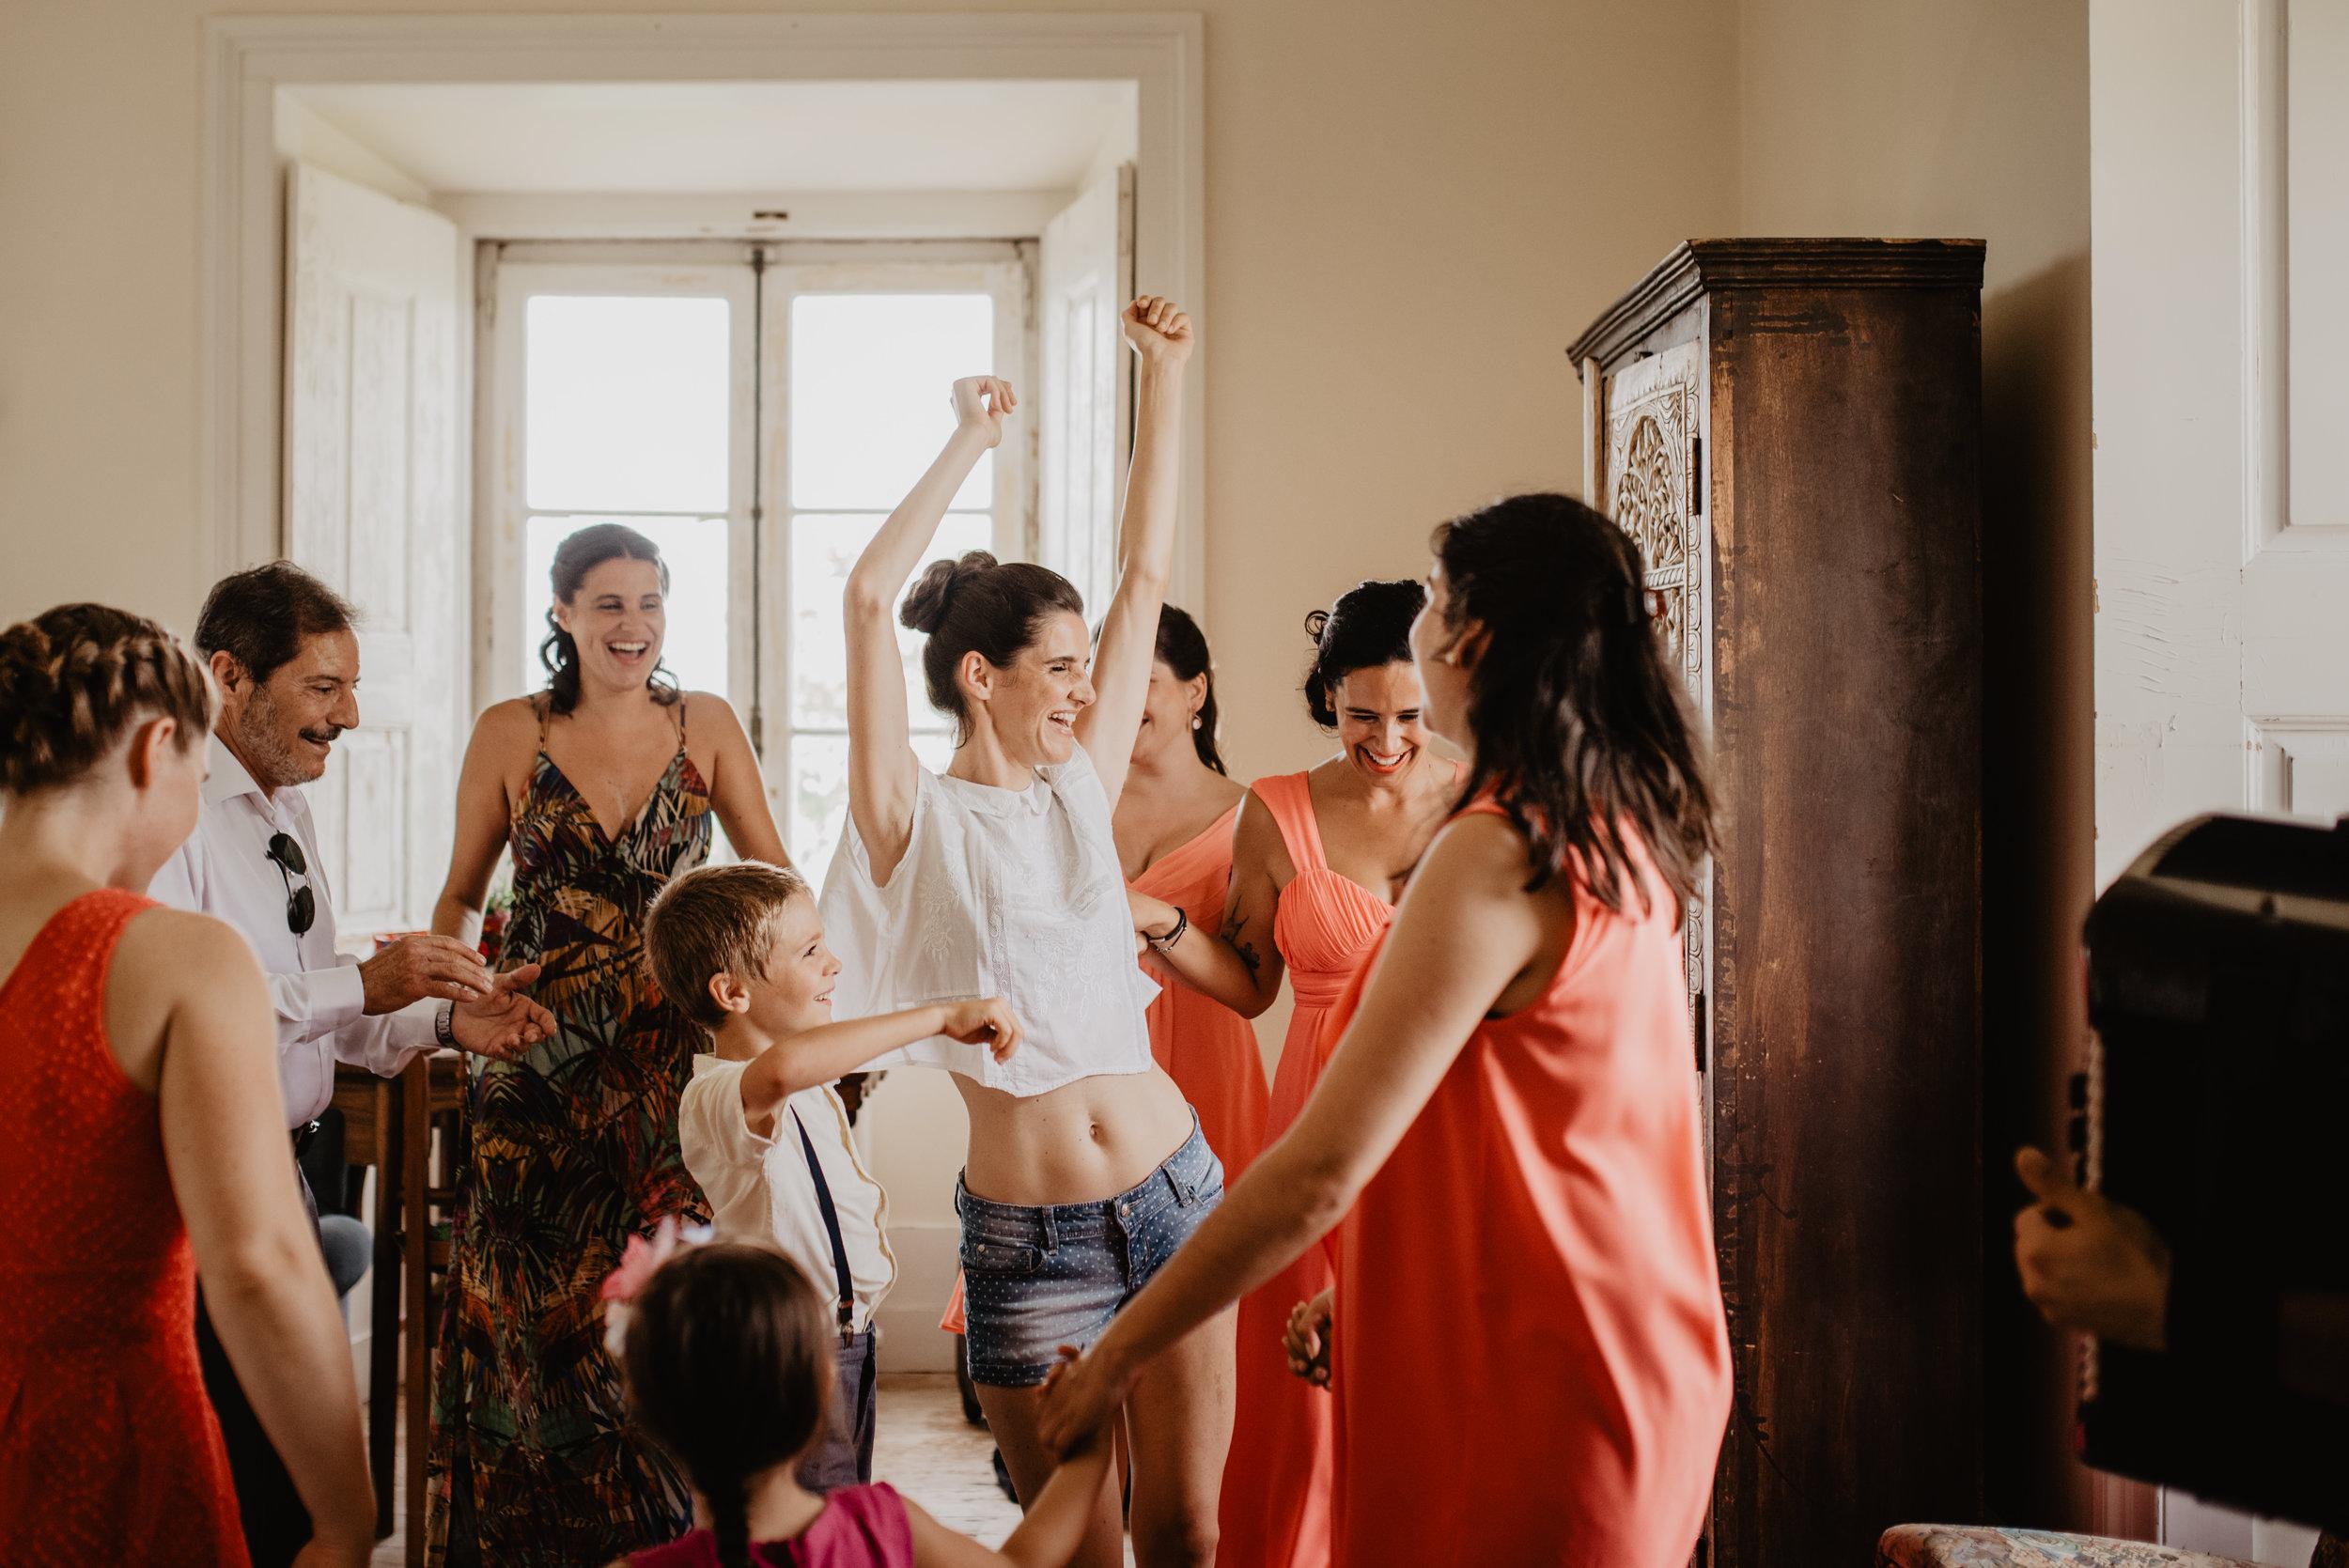 Lapela-photography-wedding-sintra-portugal-32.jpg